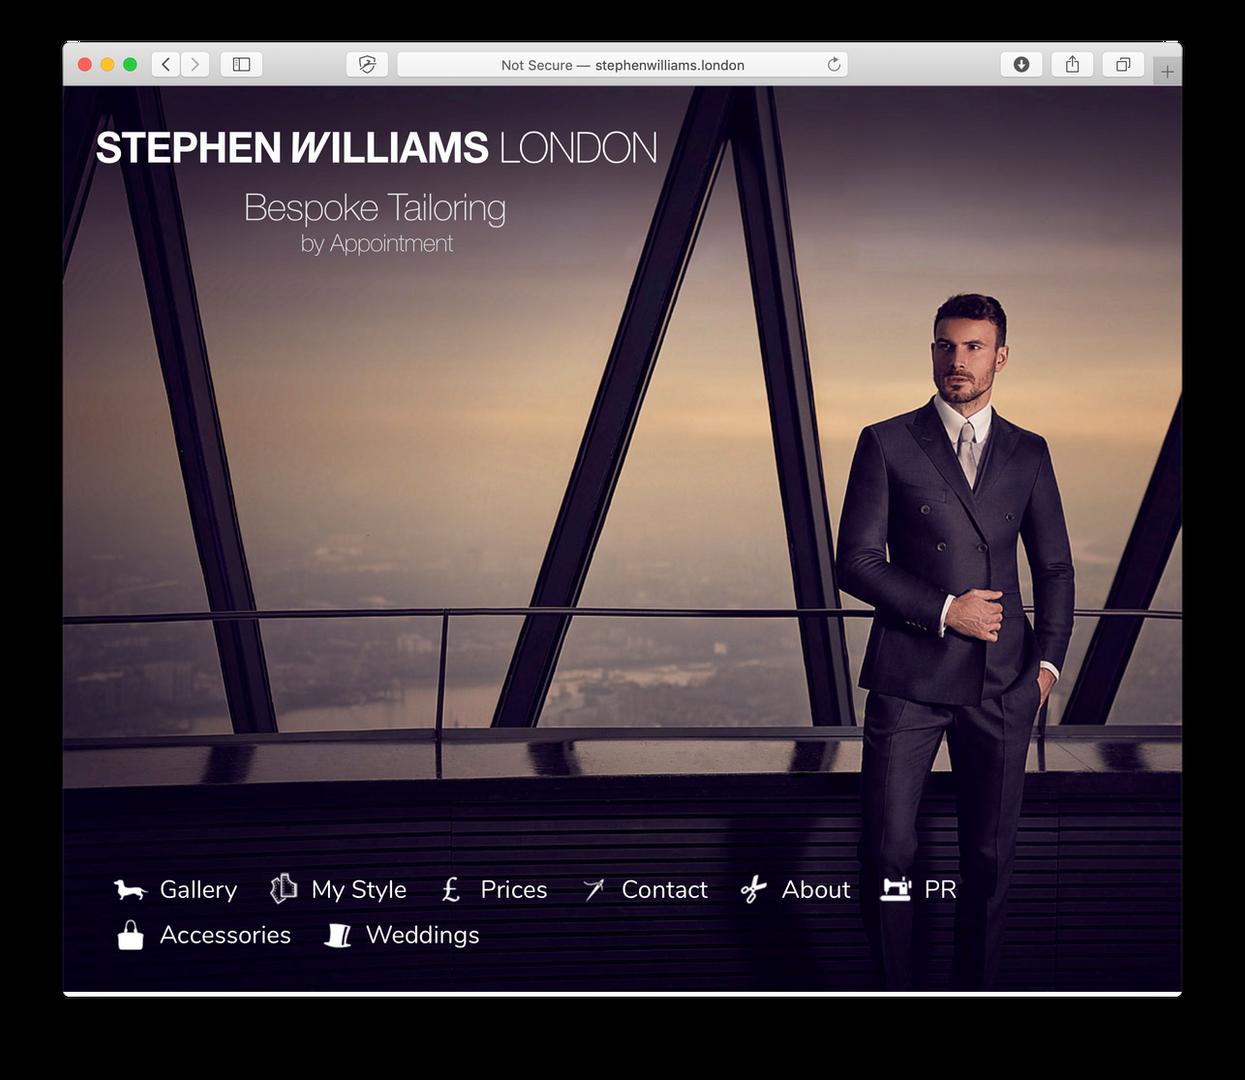 Client - Stephen Williams London